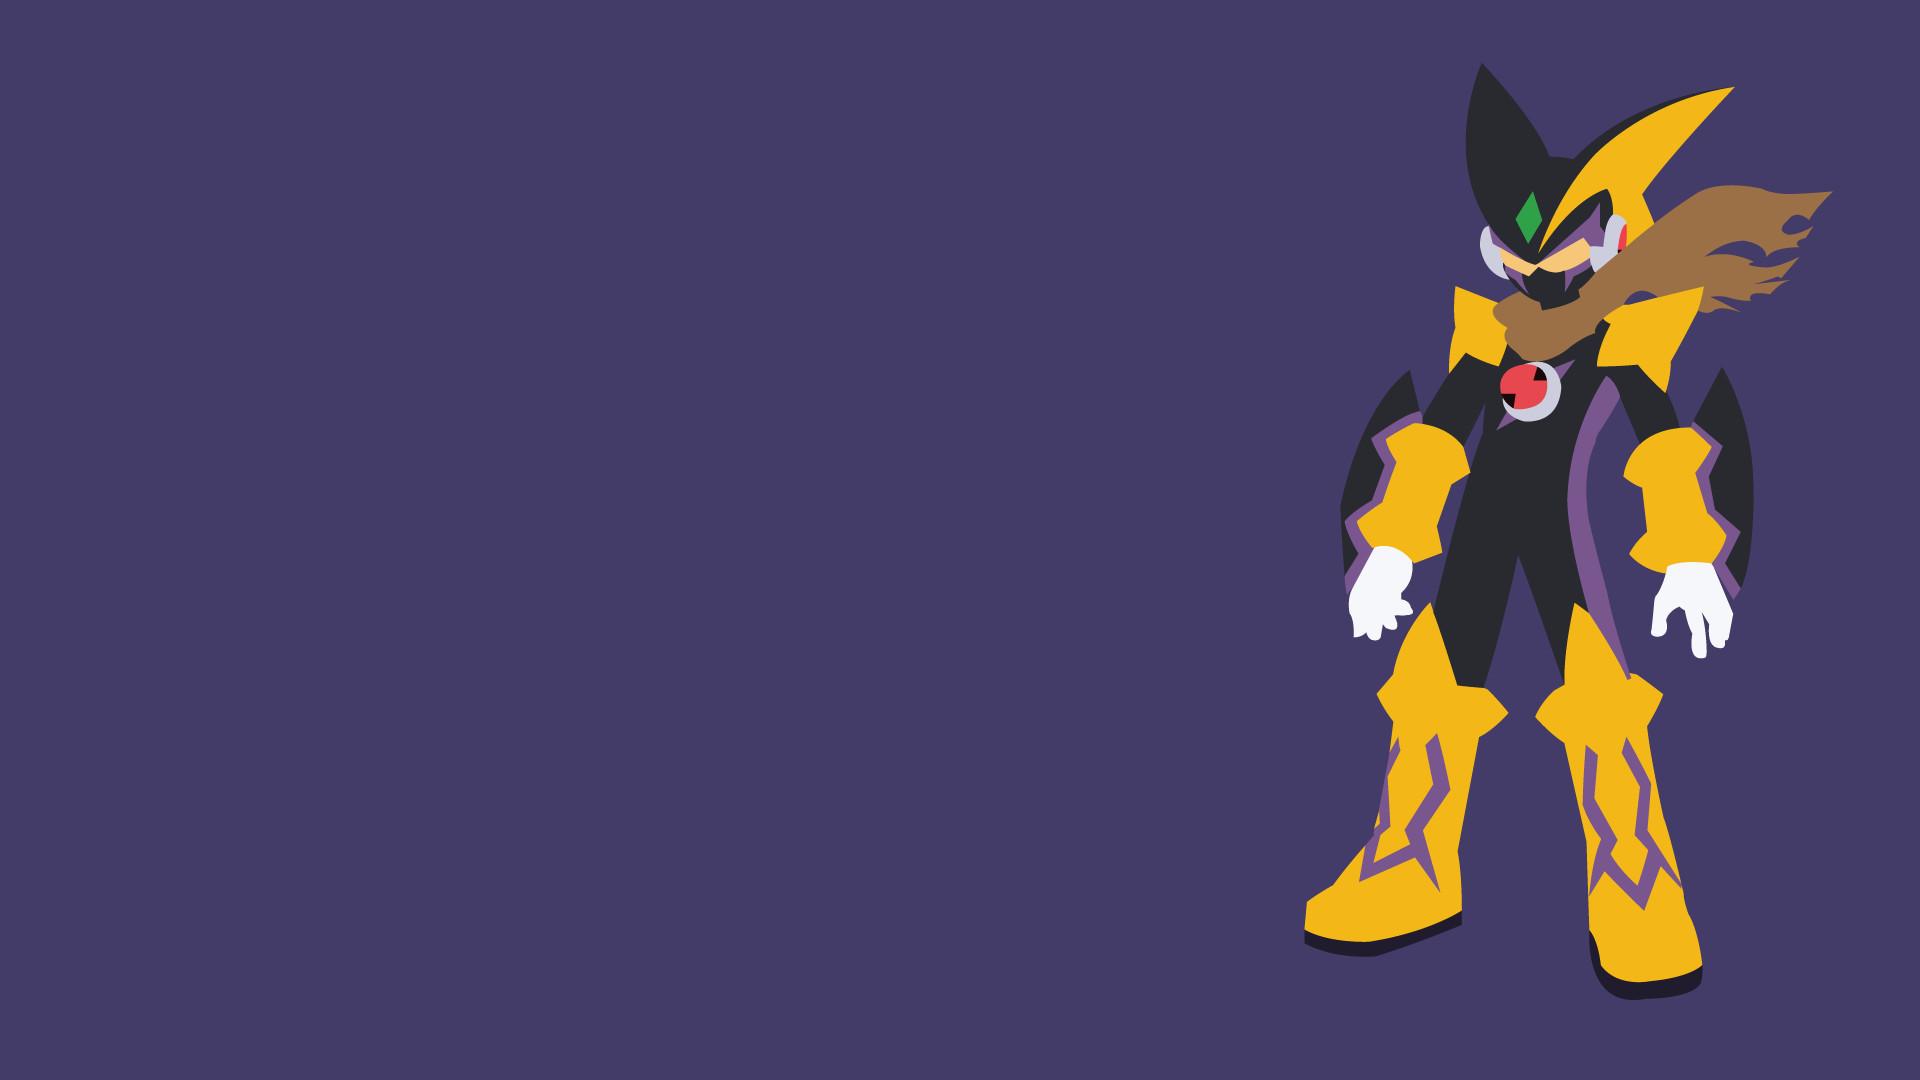 … Mega Man Battle Network – Bass Soul Wallpaper by LimeCatMastr